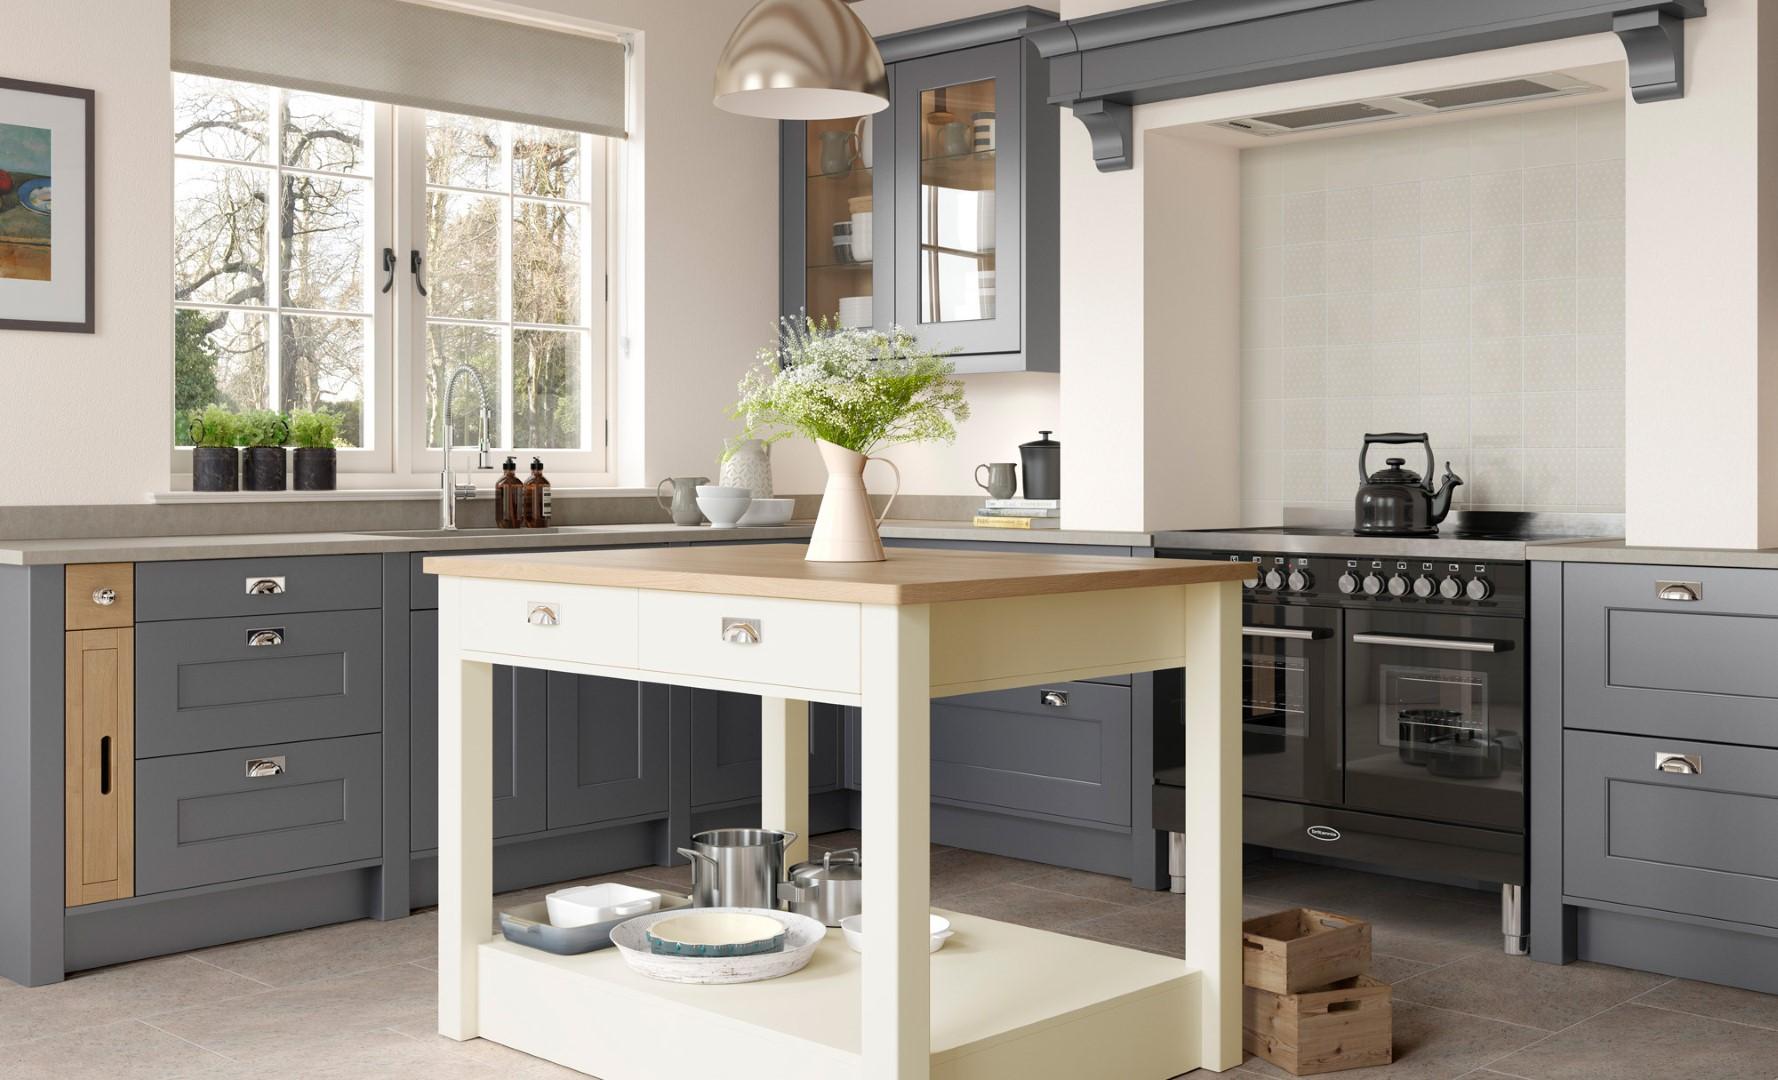 Classic Traditional Kitchen - Florence Dust Grey, Porcelain Kitchen - Kitchen Design - Alan Kelly Kitchens - Waterford